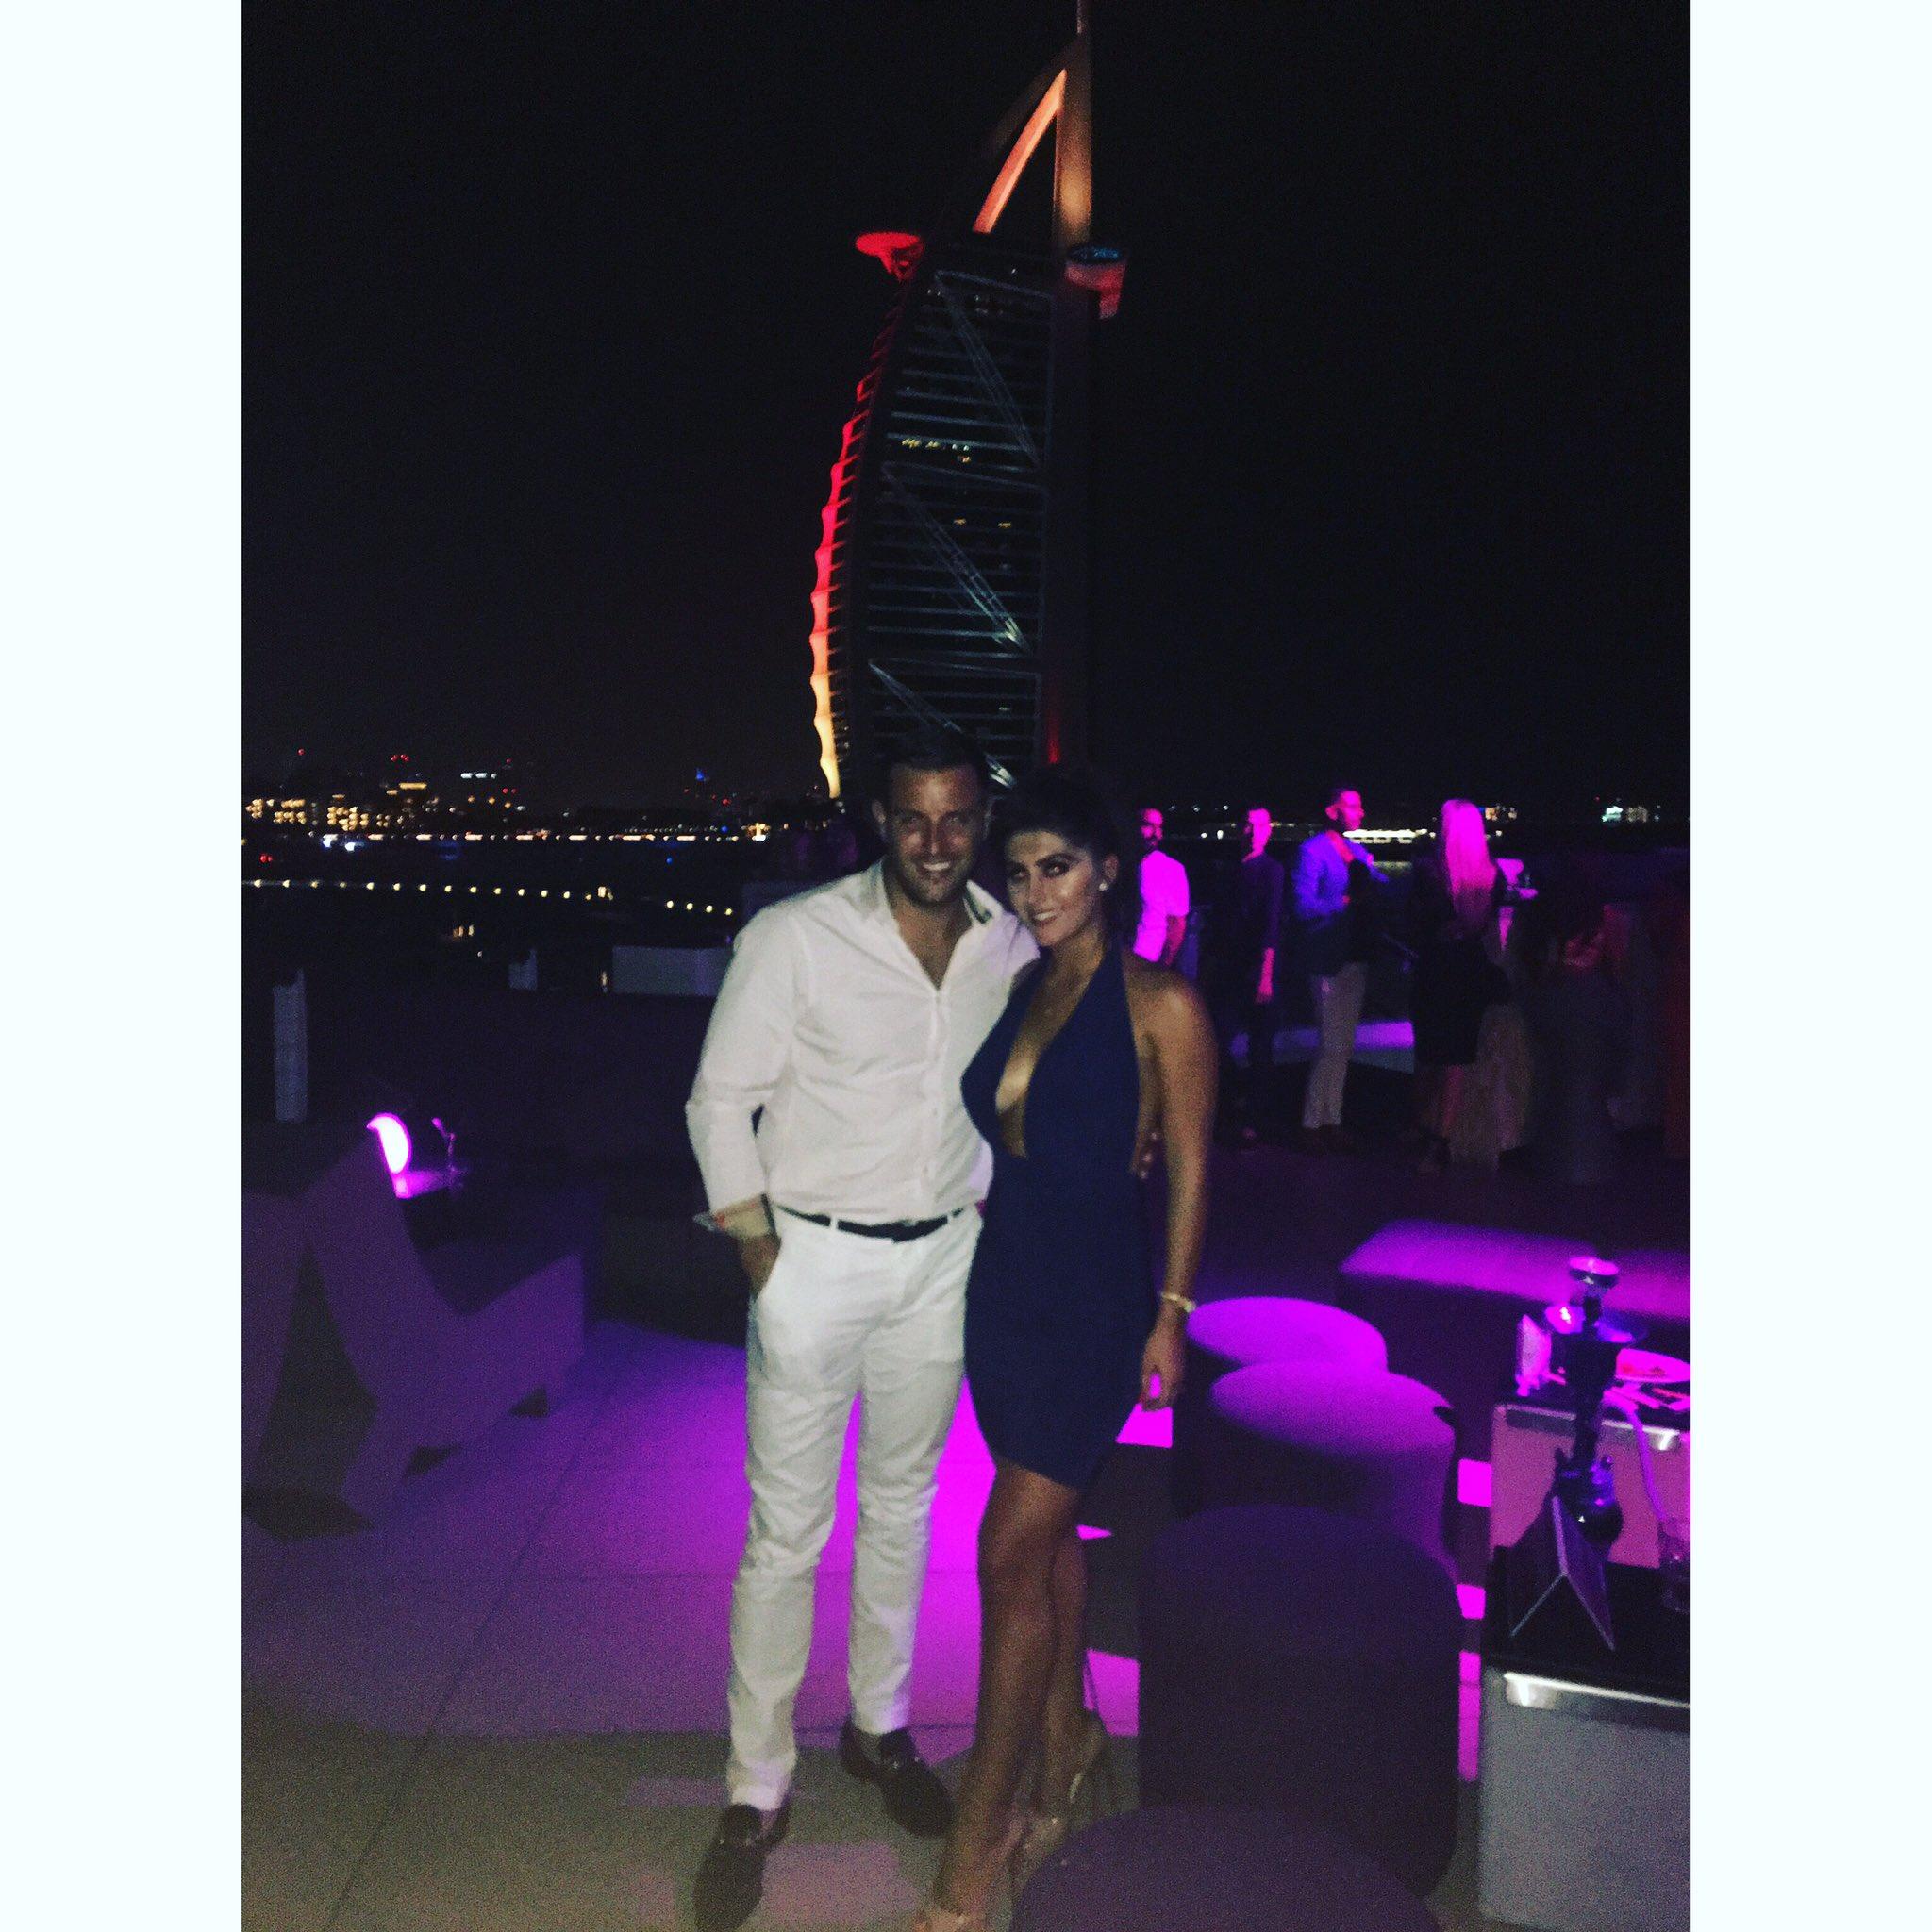 Last night... beautiful back drop... #360Bar #Dubai @SadieStuart https://t.co/qAYKwxd54Z